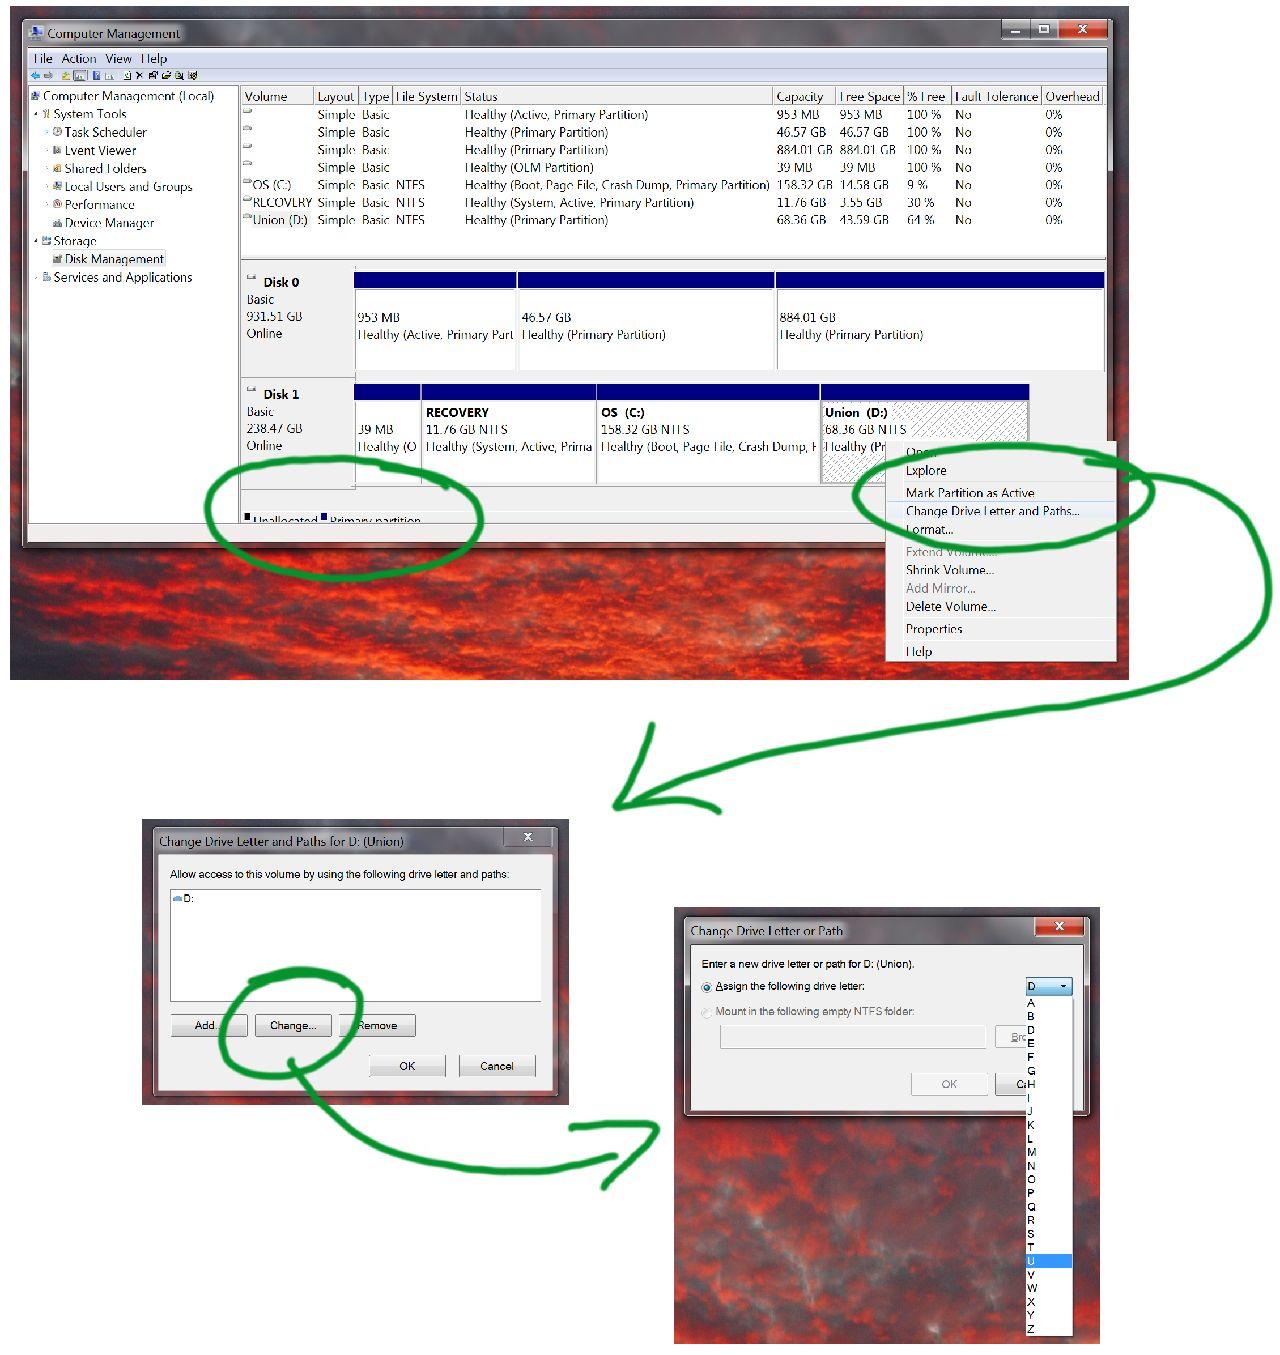 Windows change-drive letter